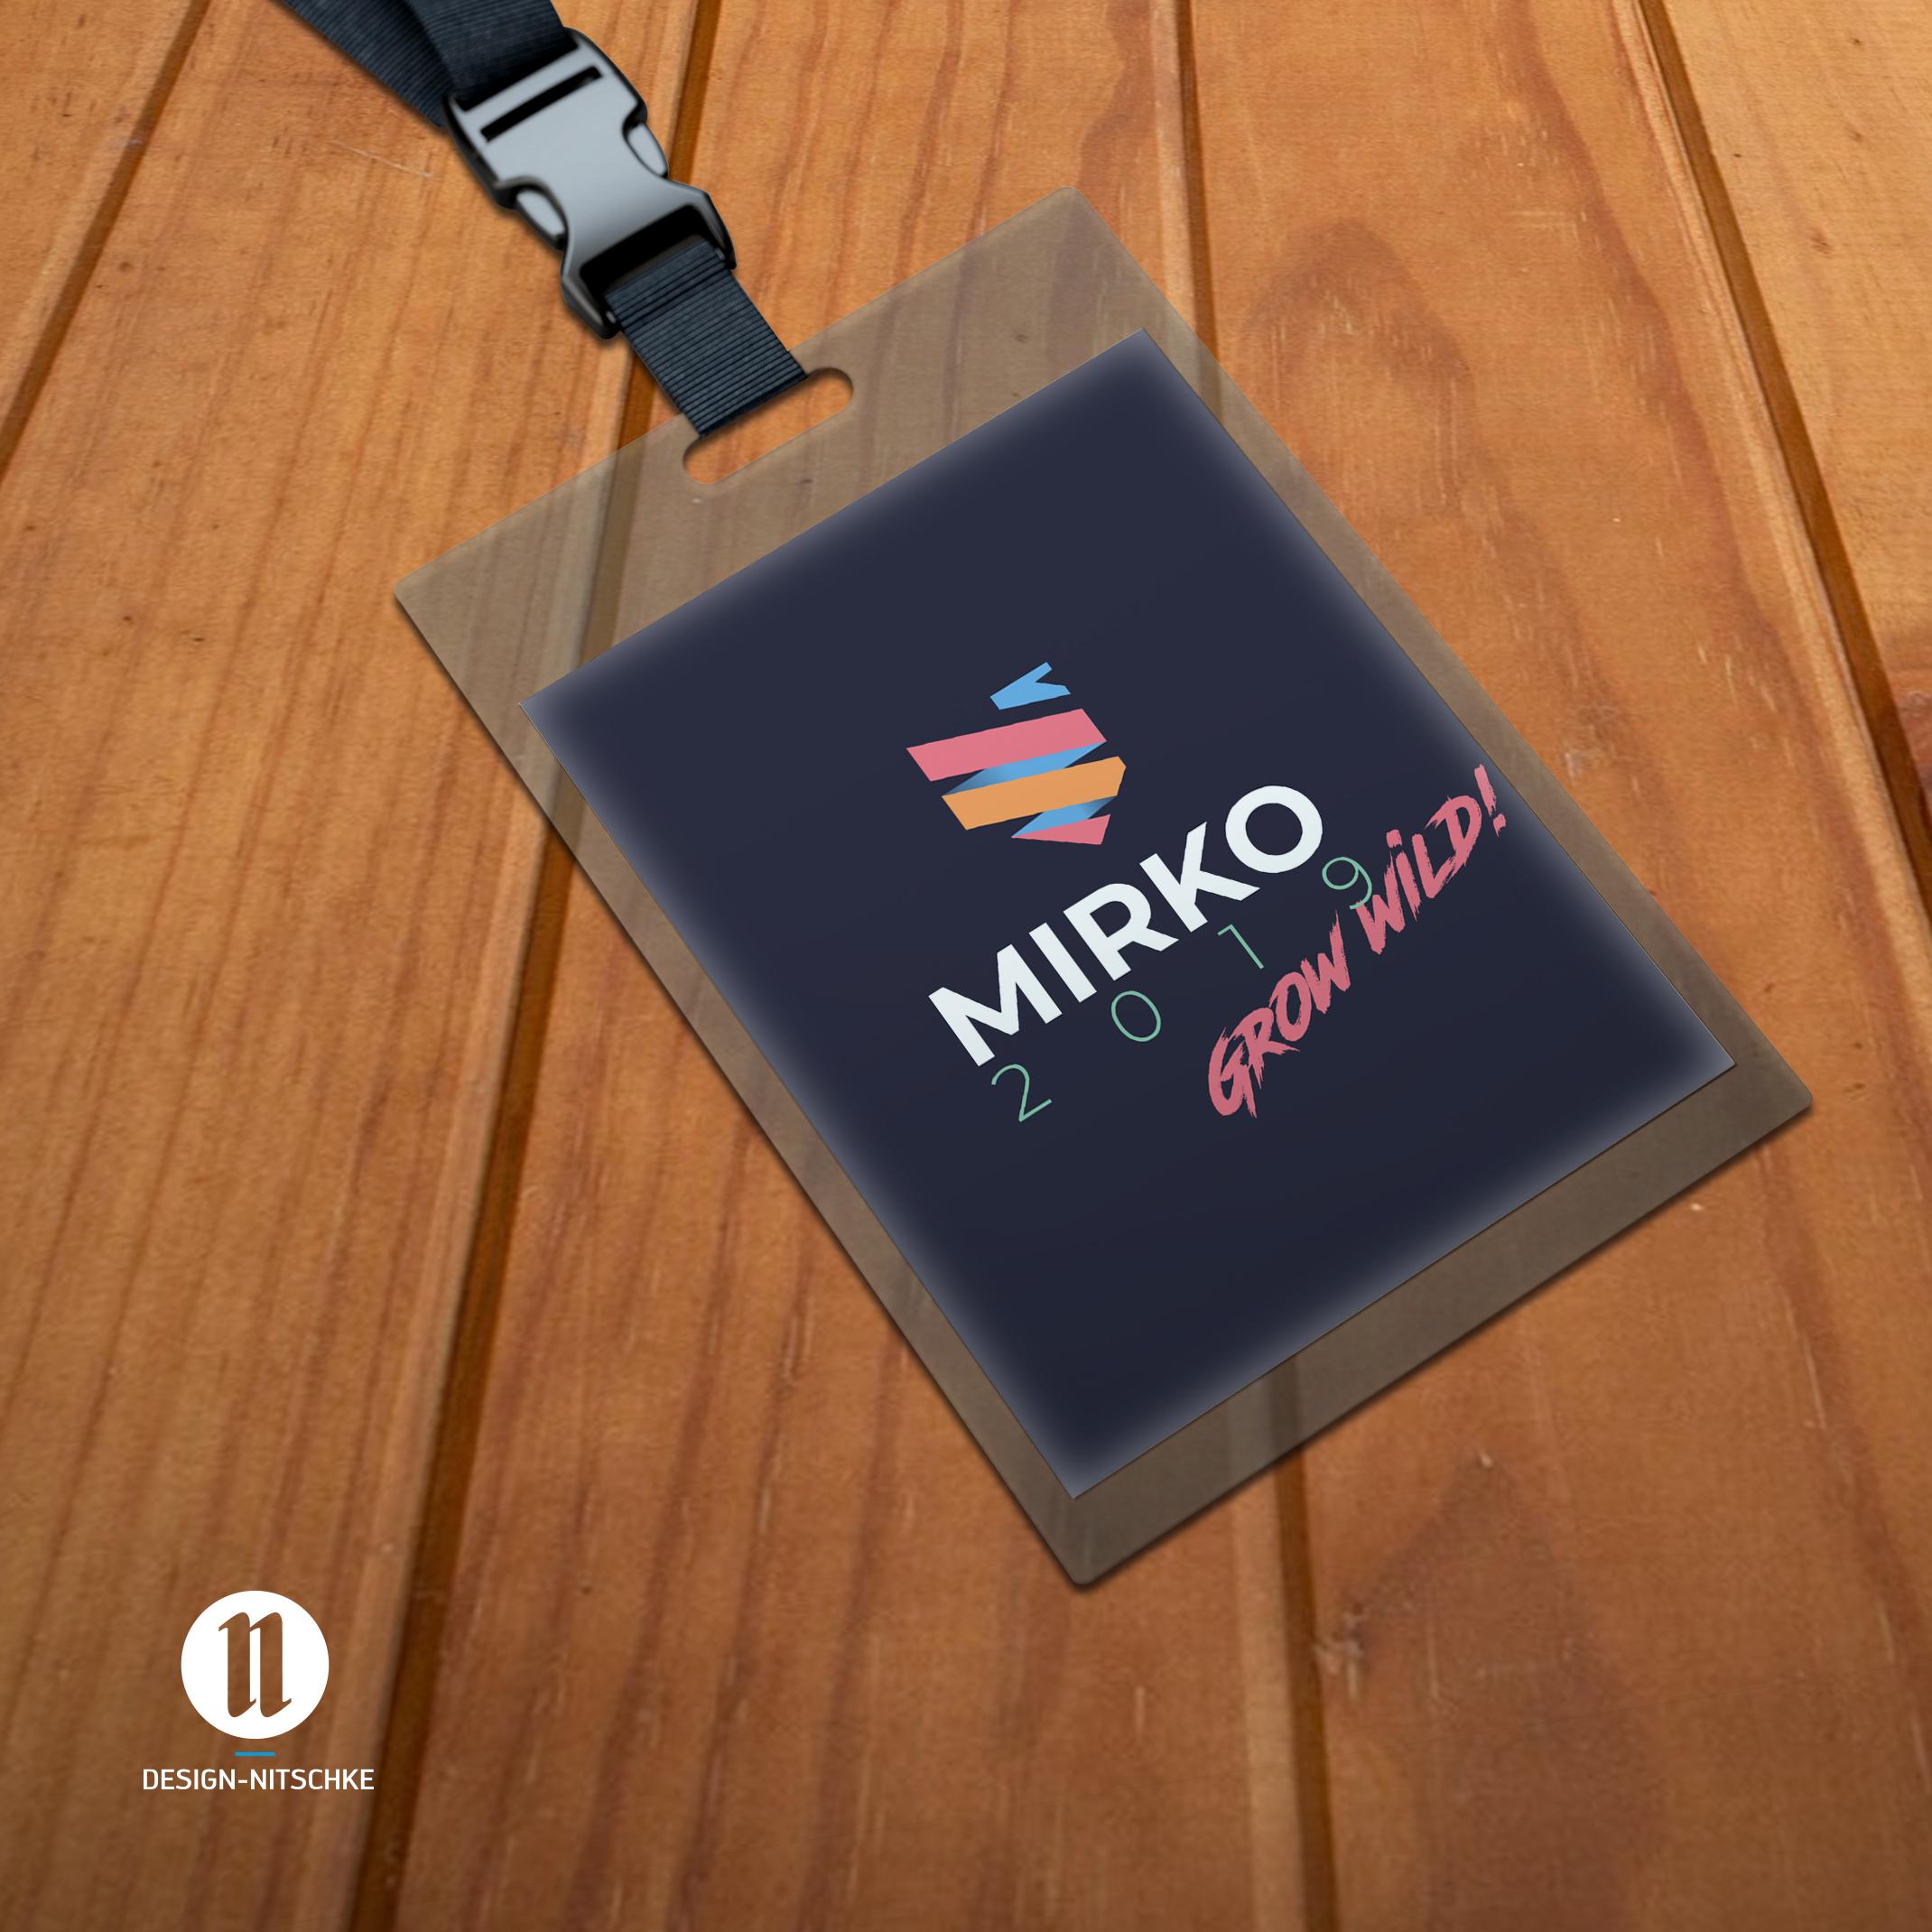 mirko2019_design_logo_wjohv_design_nitschke.jpg